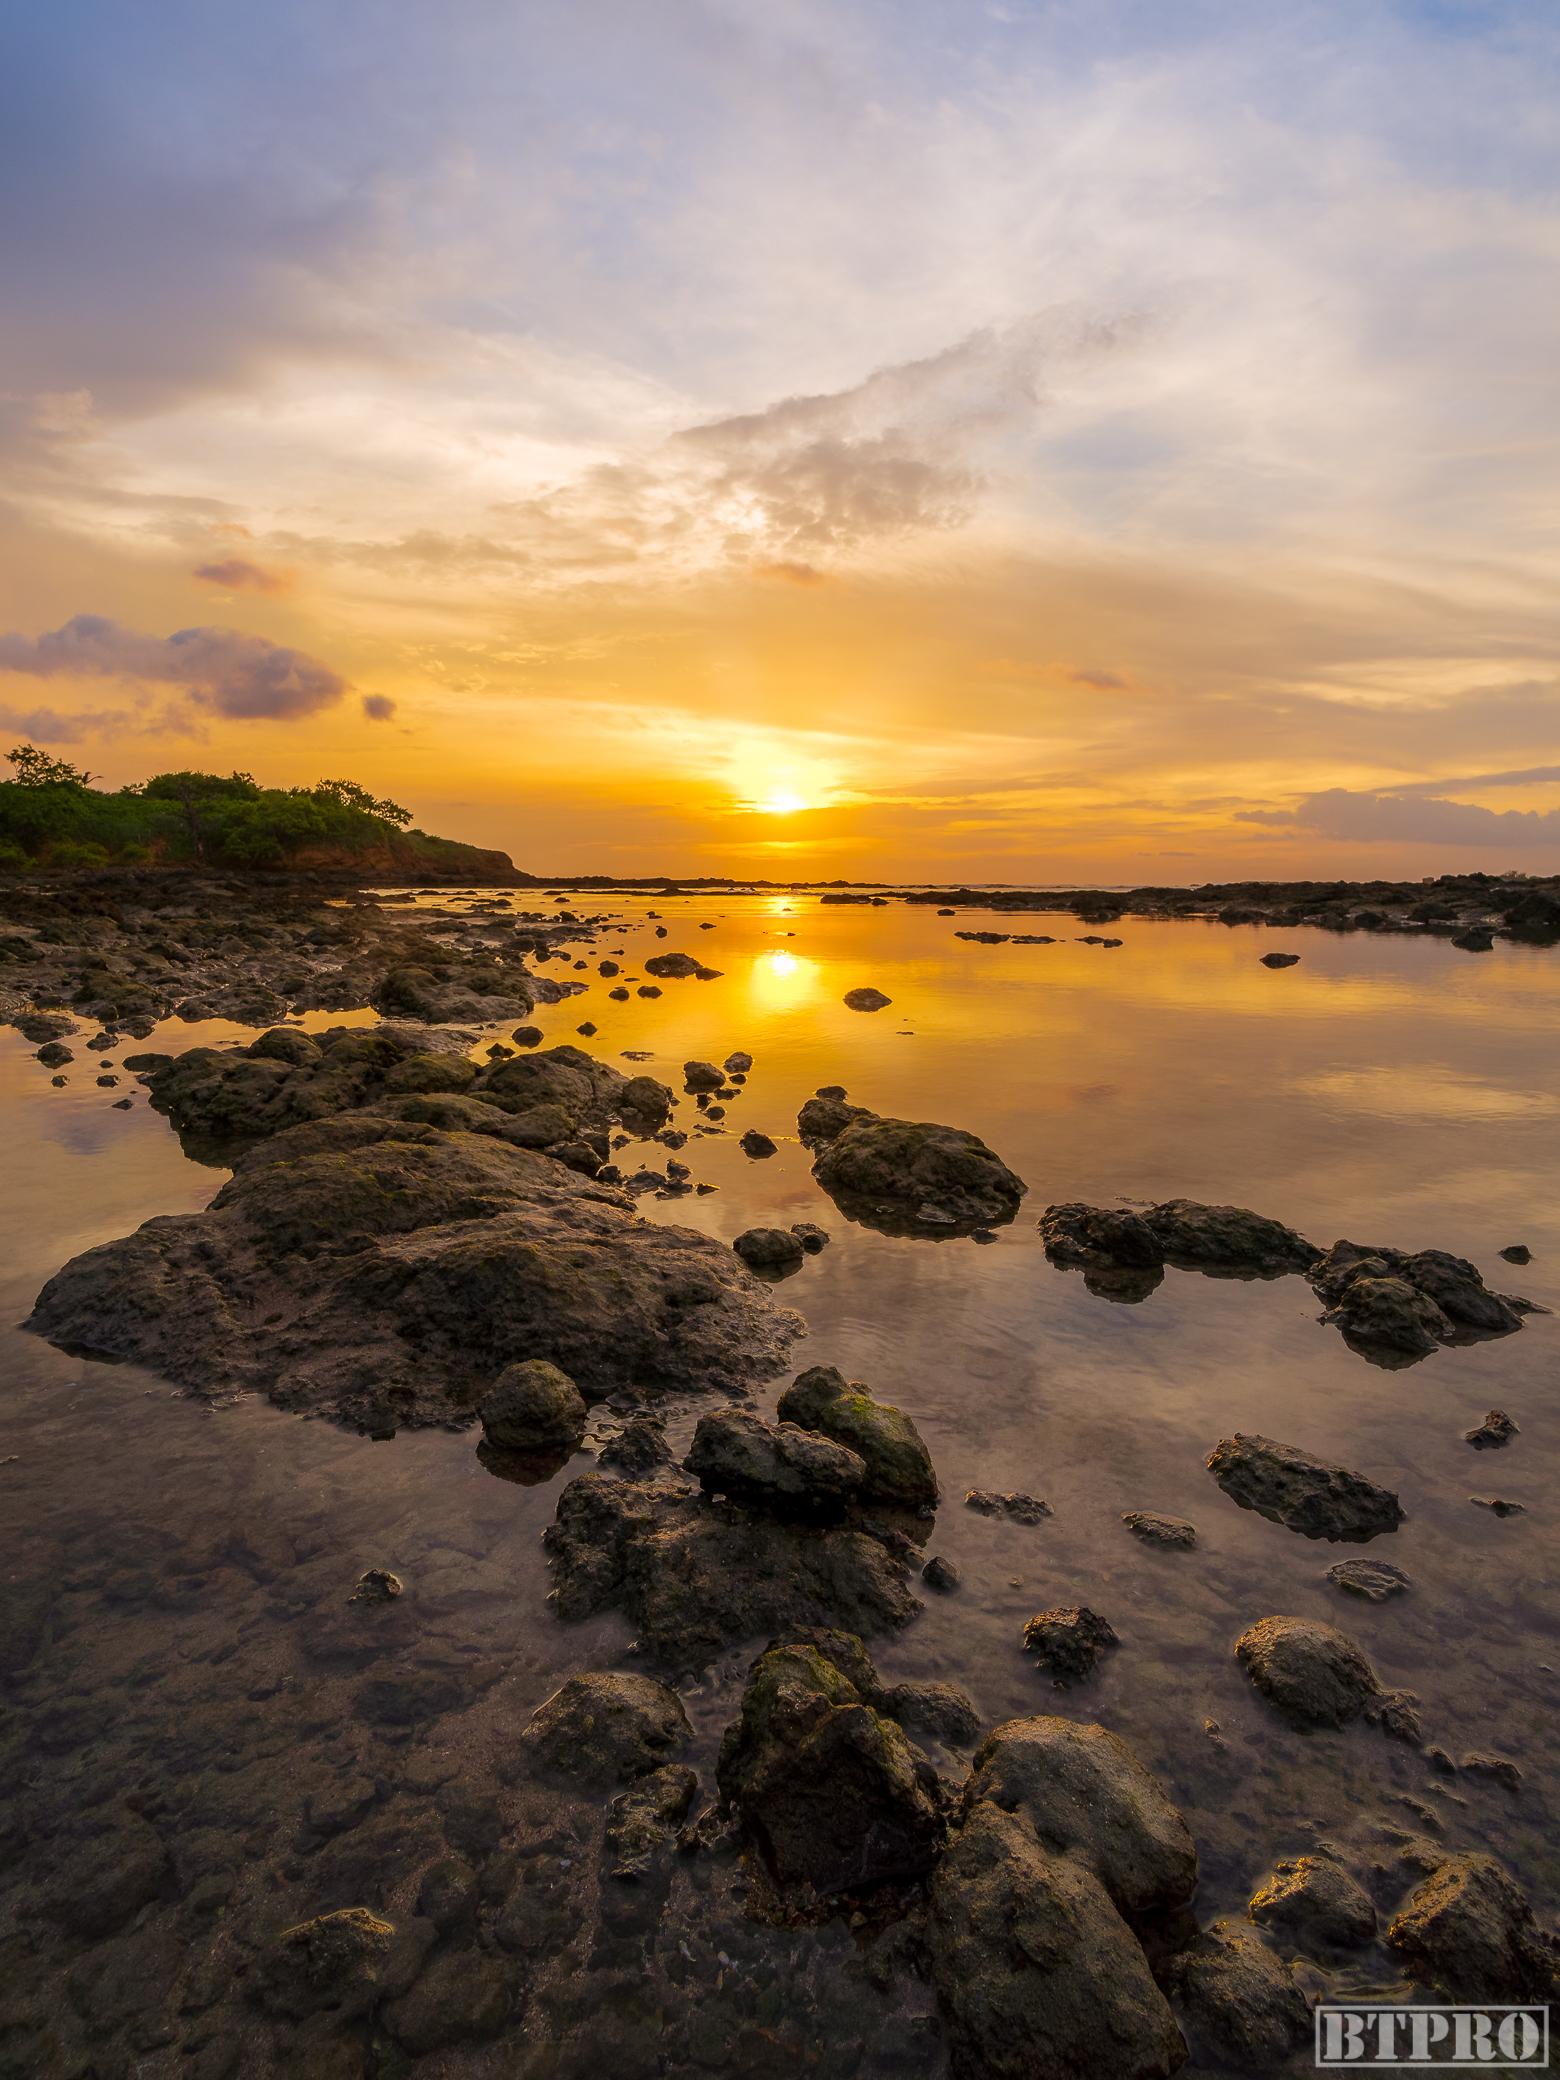 Day 2 Sunset at Tamarindo Tidepools